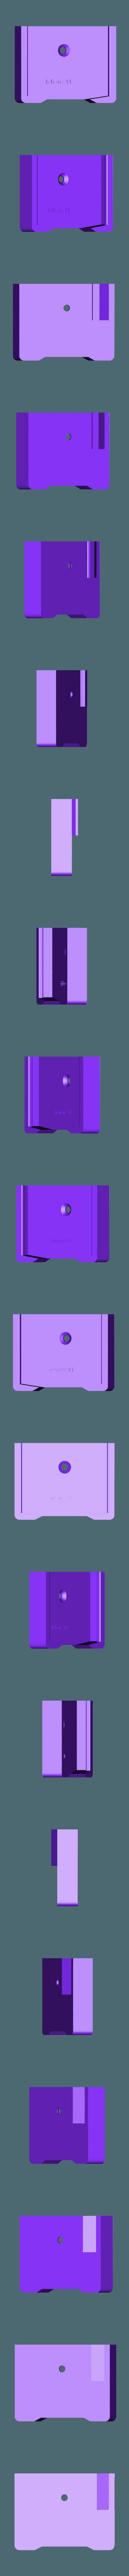 308 holder Support smartphone iphone 11.STL Download STL file Peugeot 308 smartphone support • 3D printer design, C1-concept